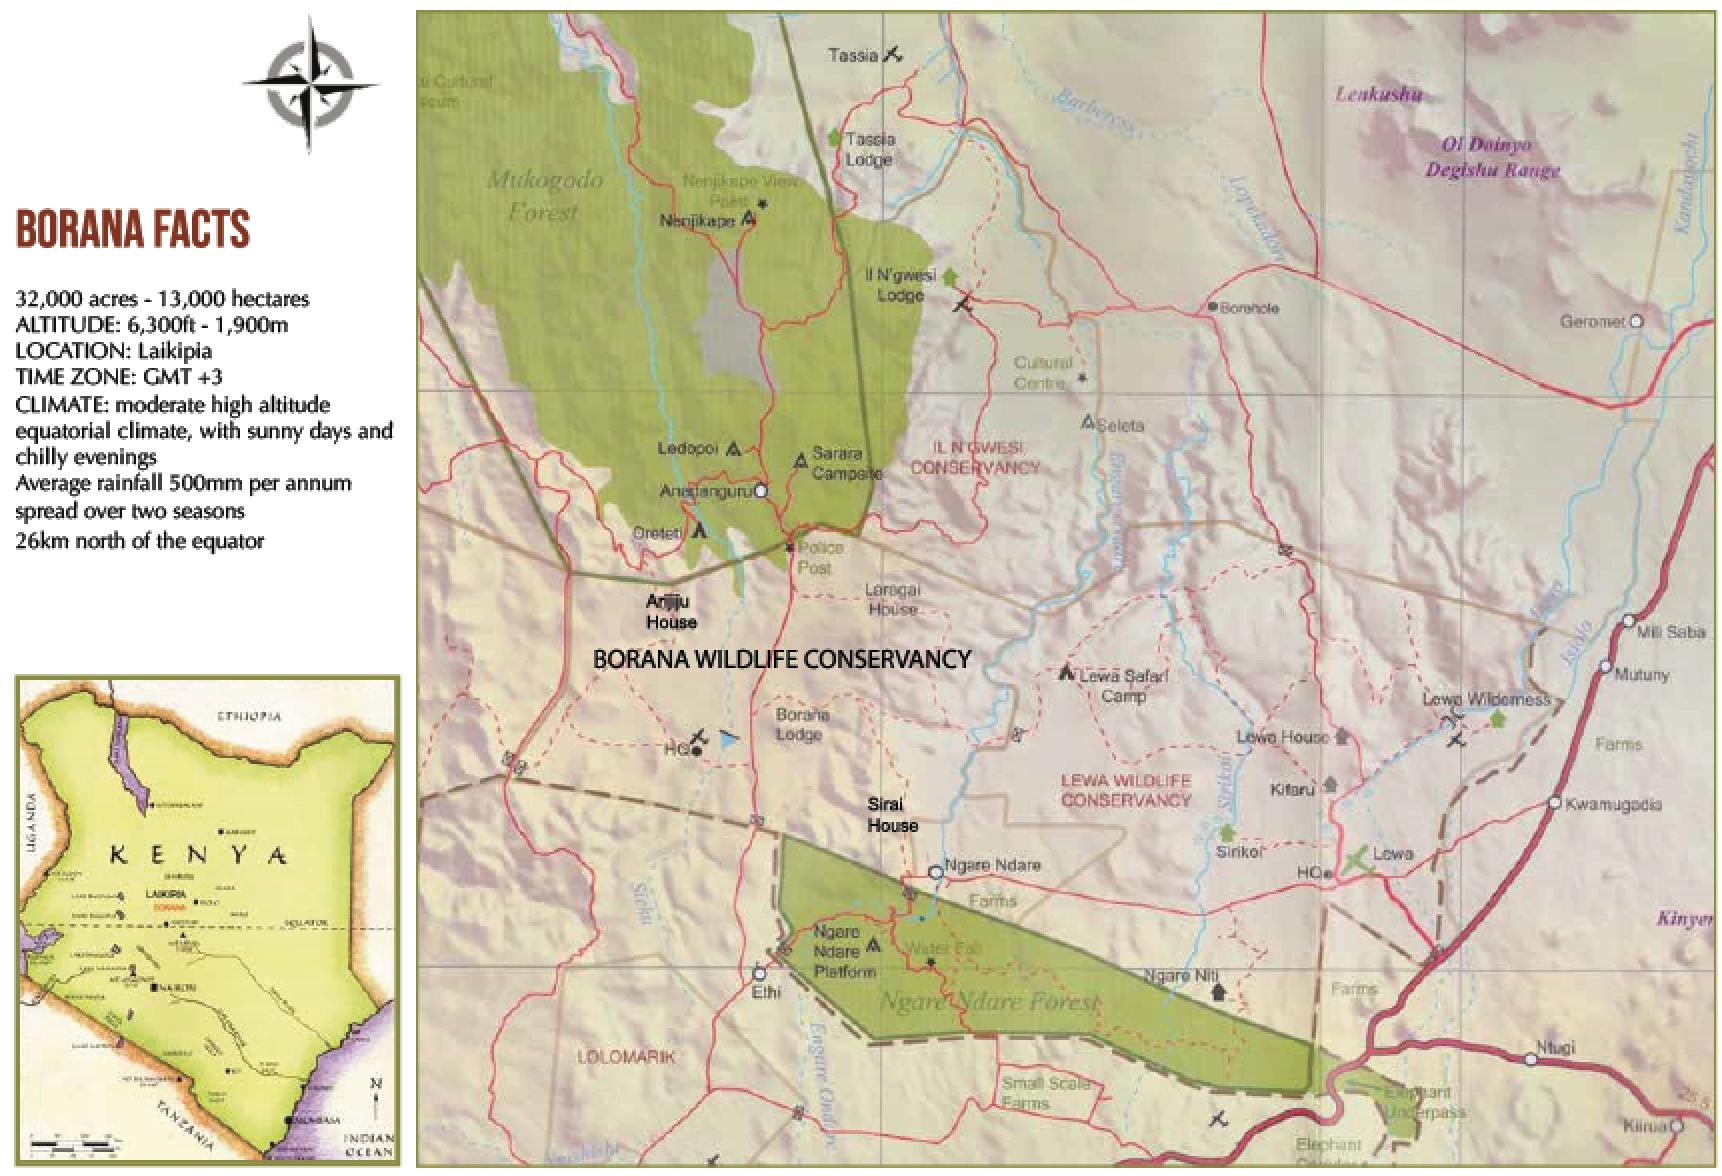 Map of the Borana Conservancy